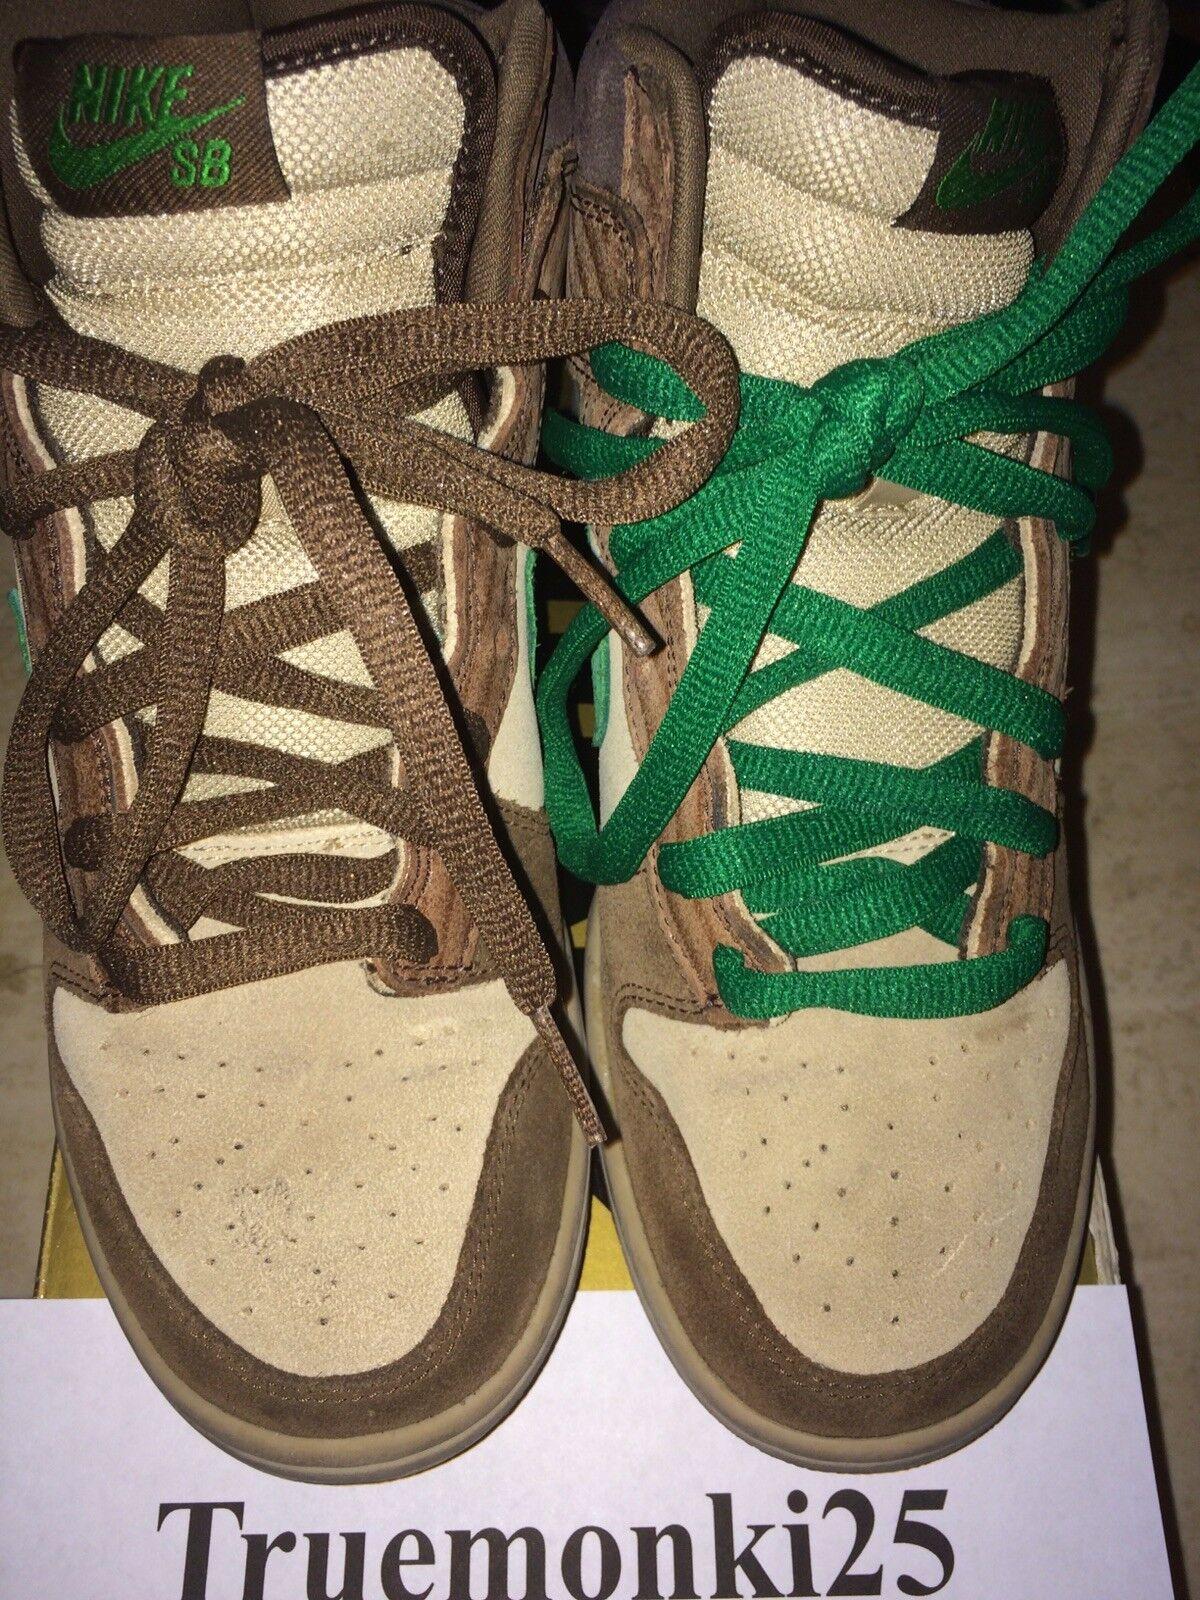 Nike SB Dunk Hi Deck Size 6.5 Sneakers Shoes Gold Box Skate Boarding